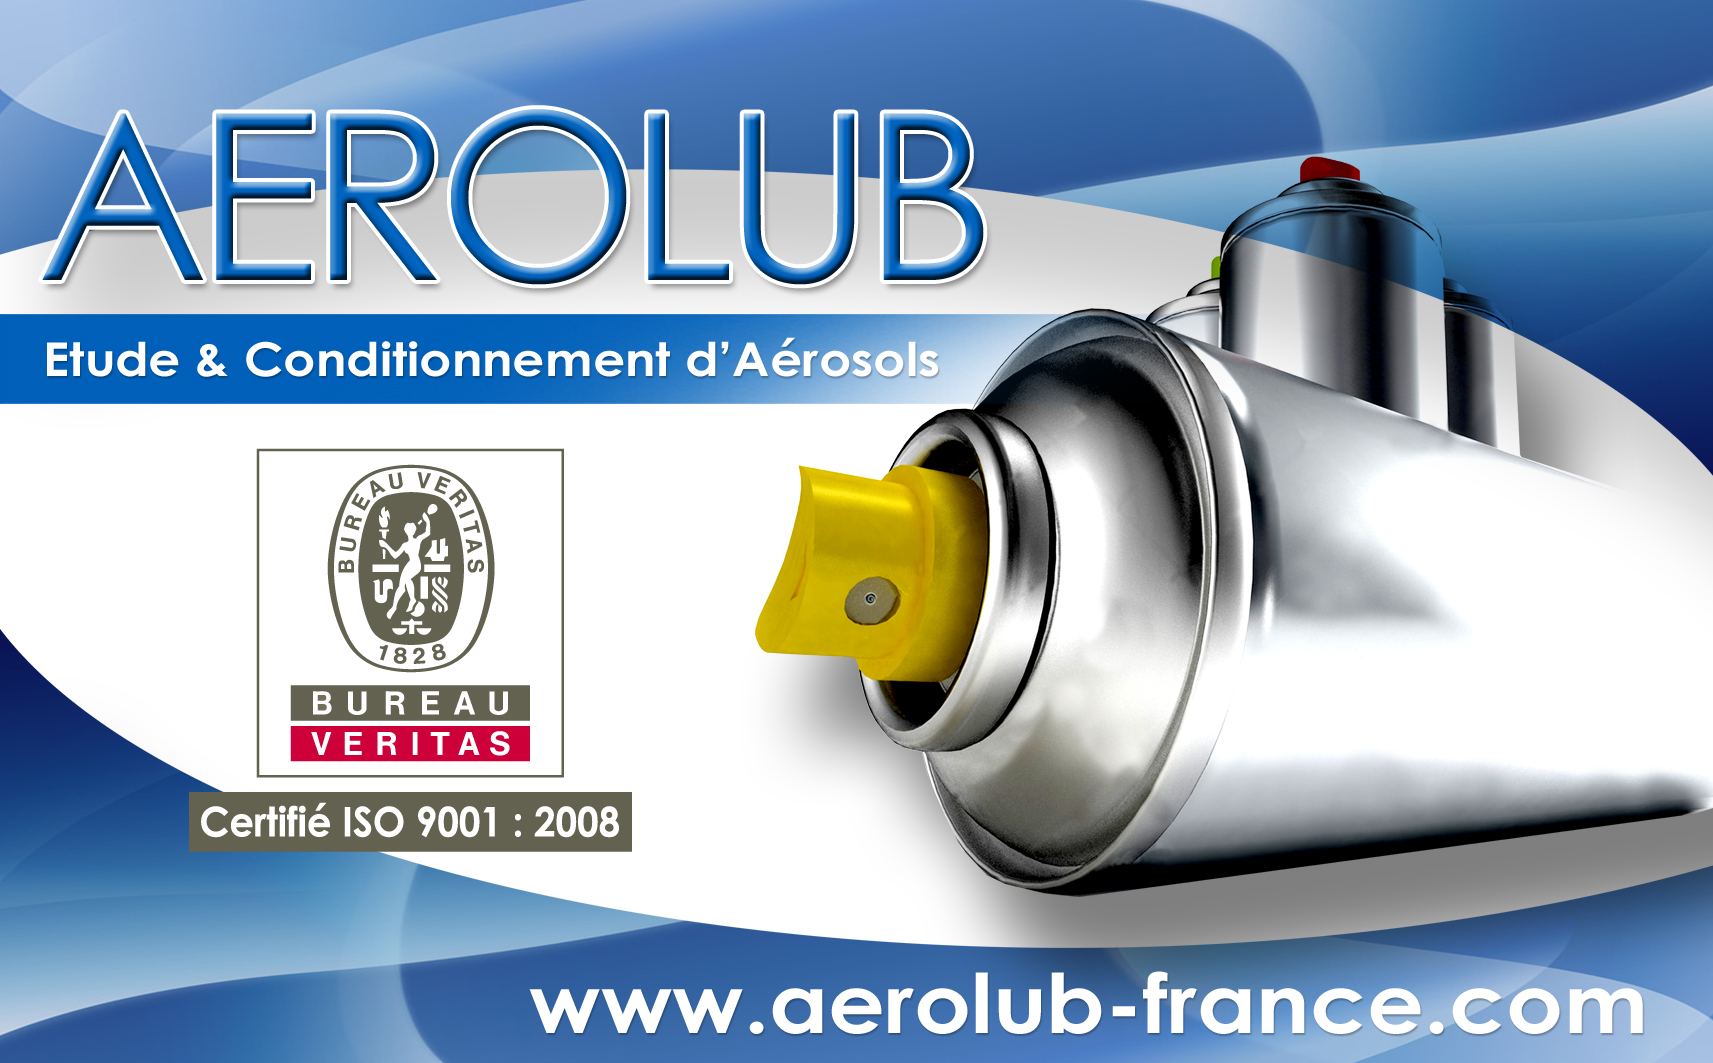 AEROLUB FRANCE